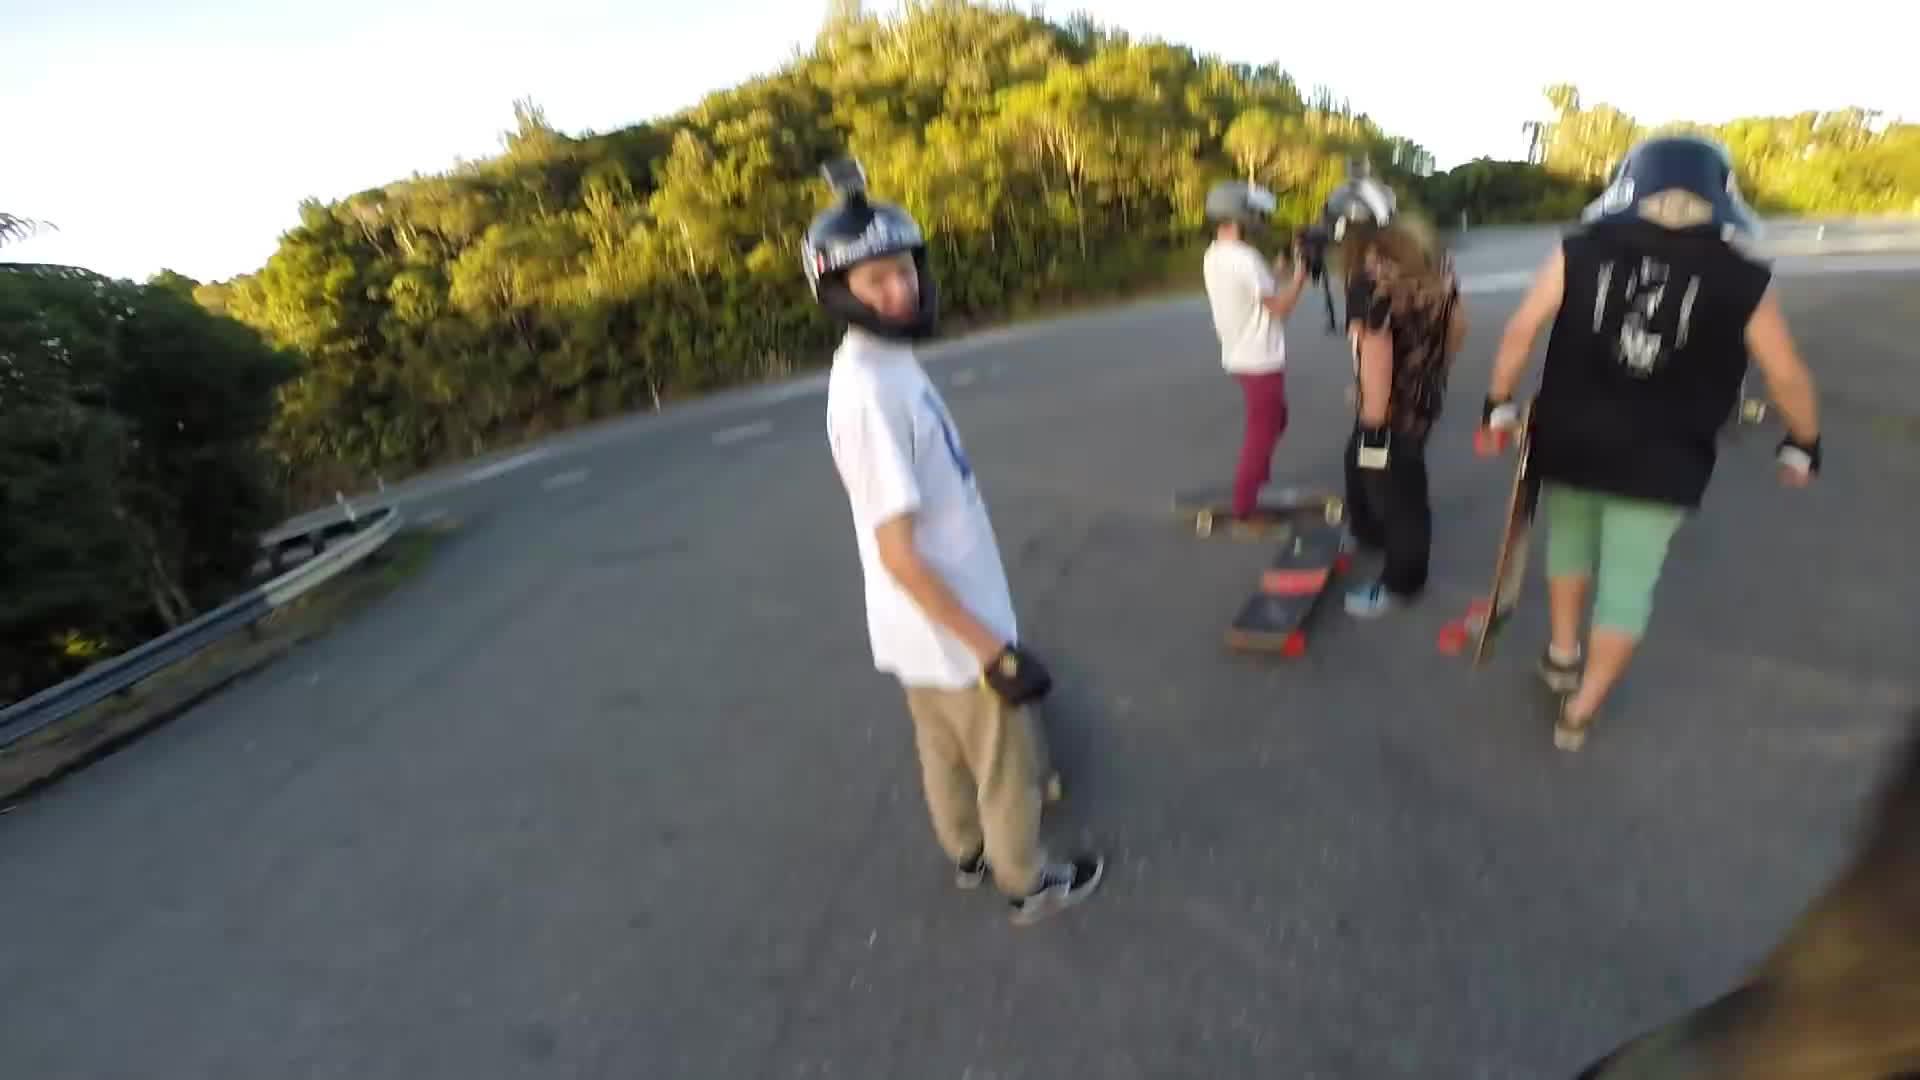 downhill, longboarding, redditisfun, Longboarding: MUKA RAW (1080p 60fps) GIFs